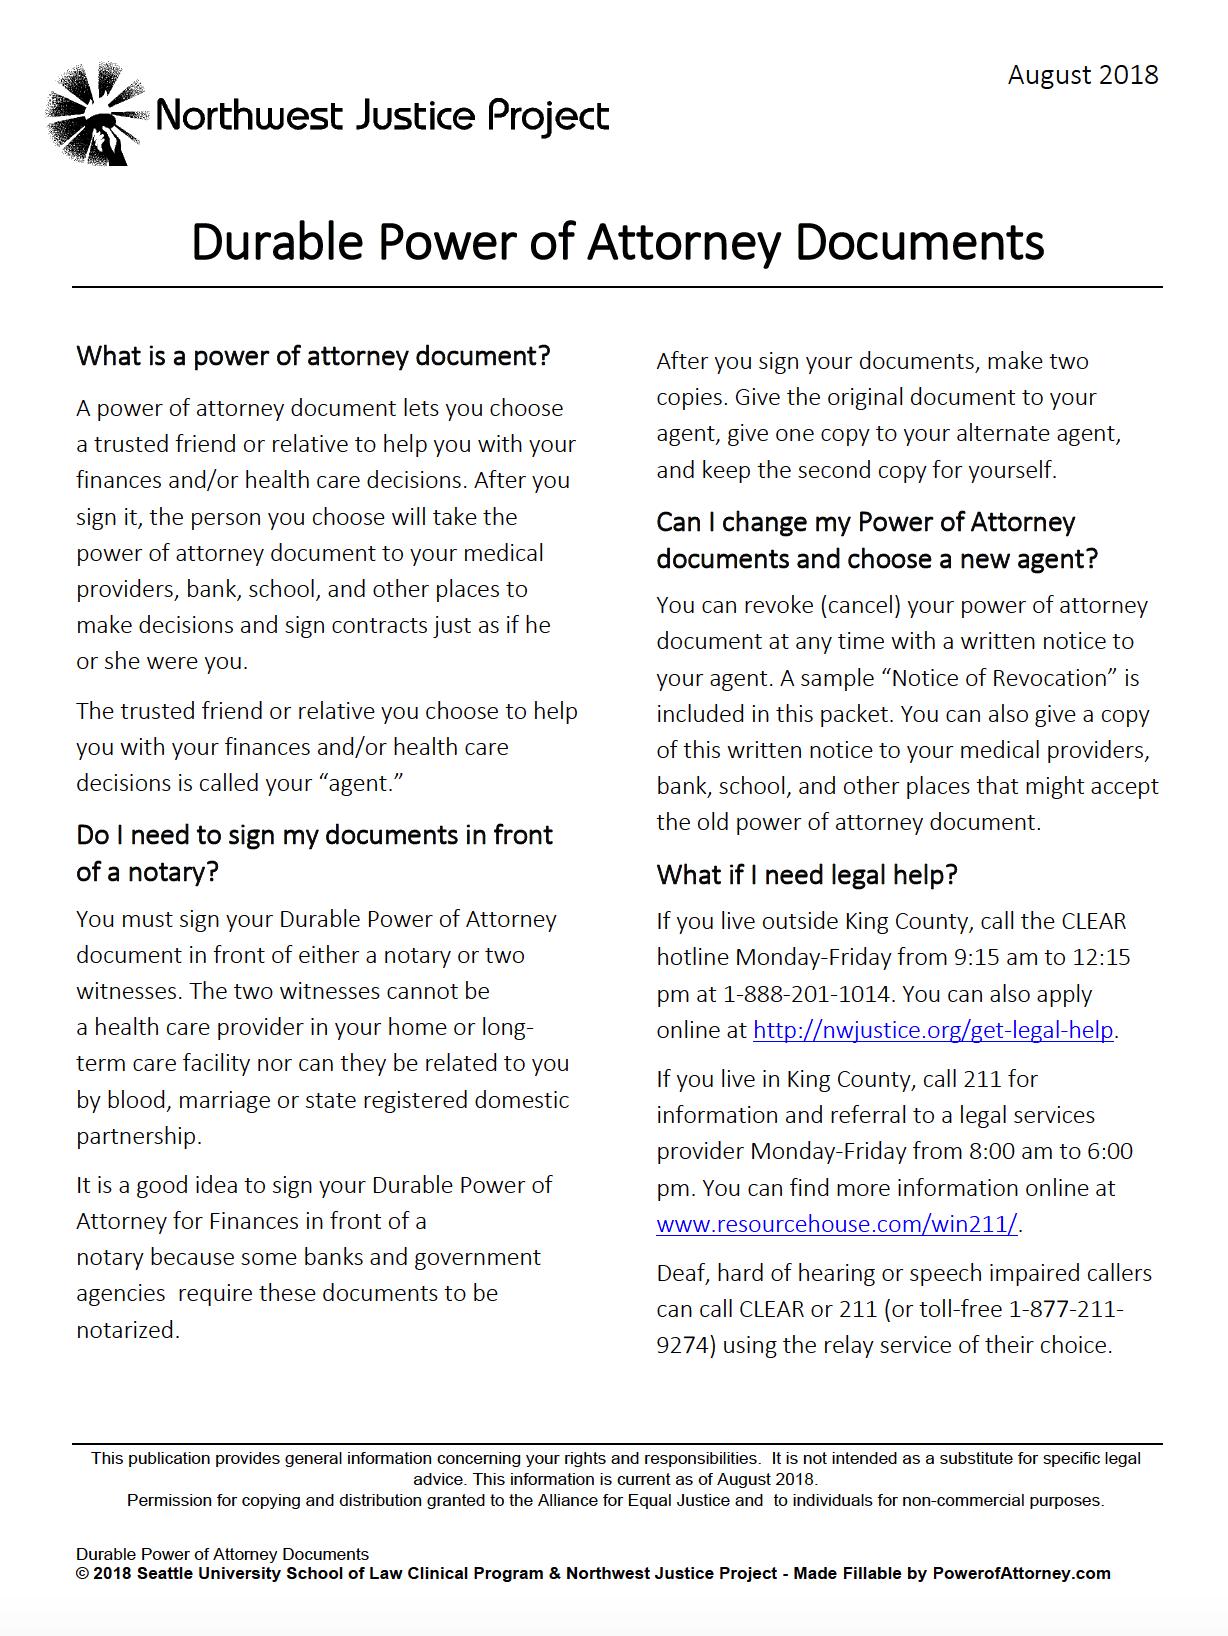 Free Durable Power Of Attorney Washington Form Adobe PDF